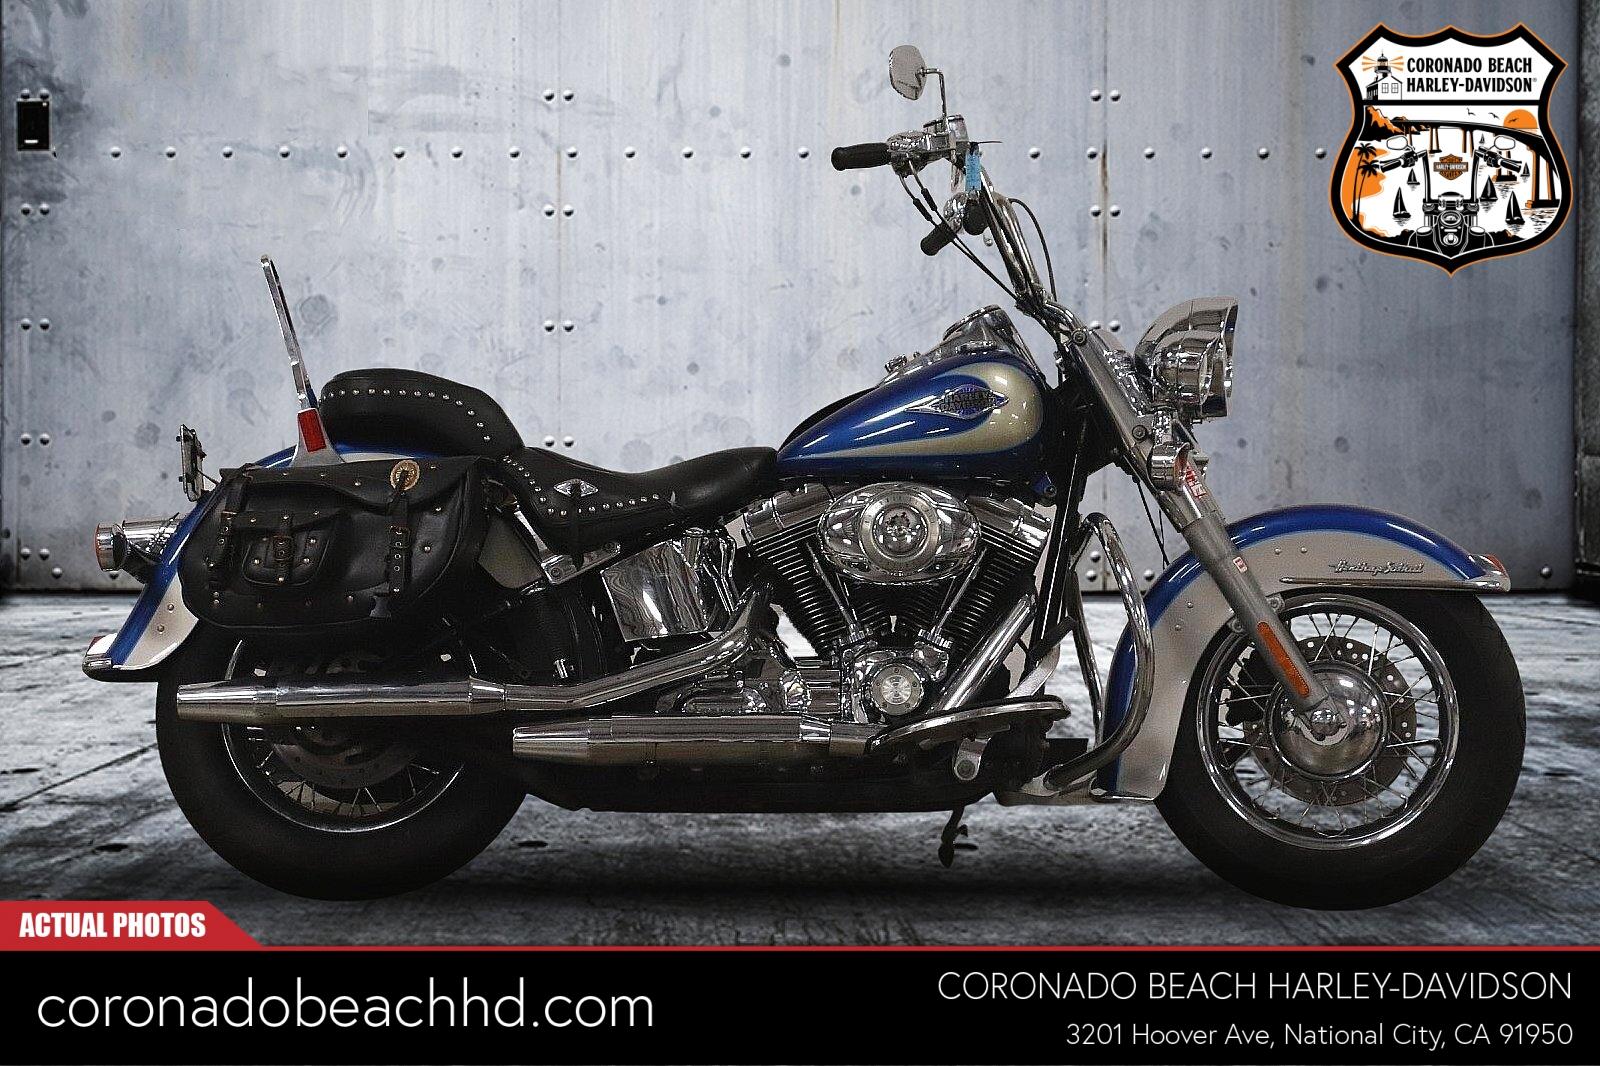 2009 Harley-Davidson Heritage Softail Classic [77]